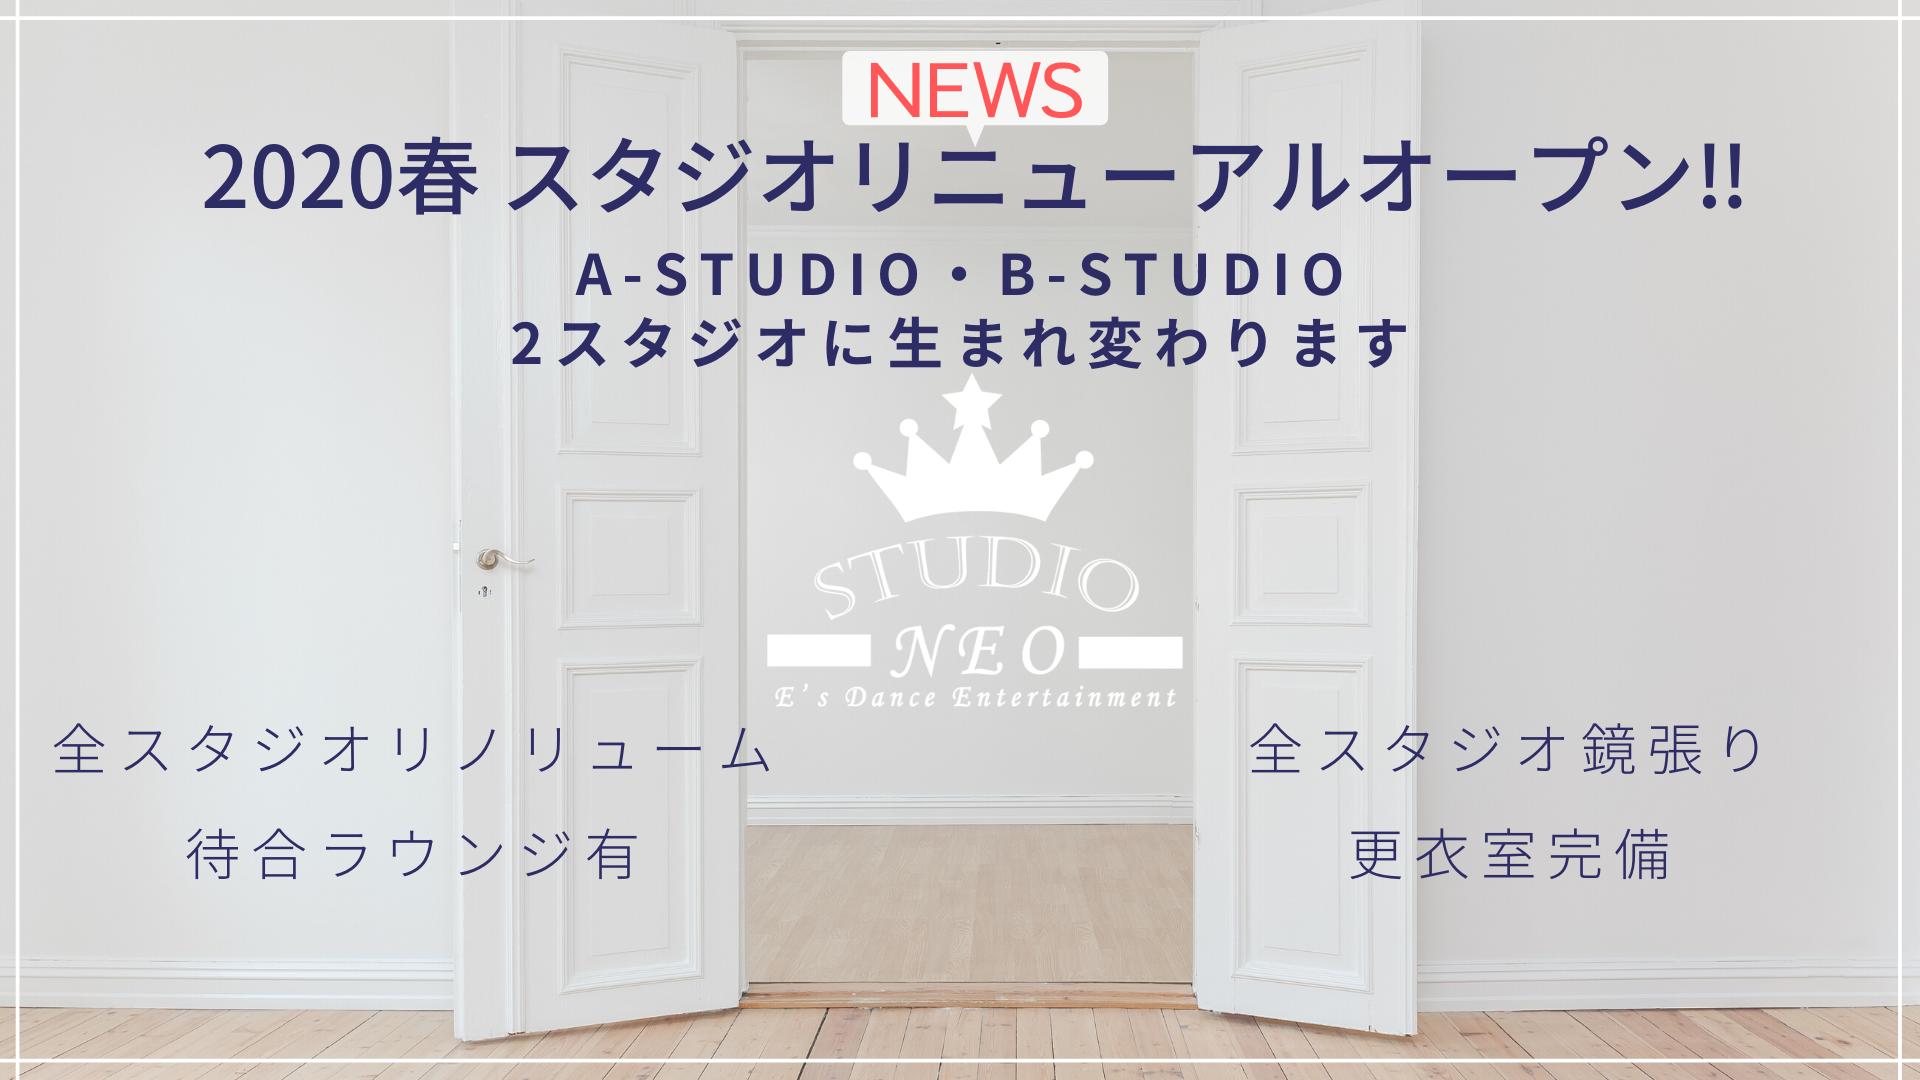 2020 Spring スタジオリニューアルオープン‼.png